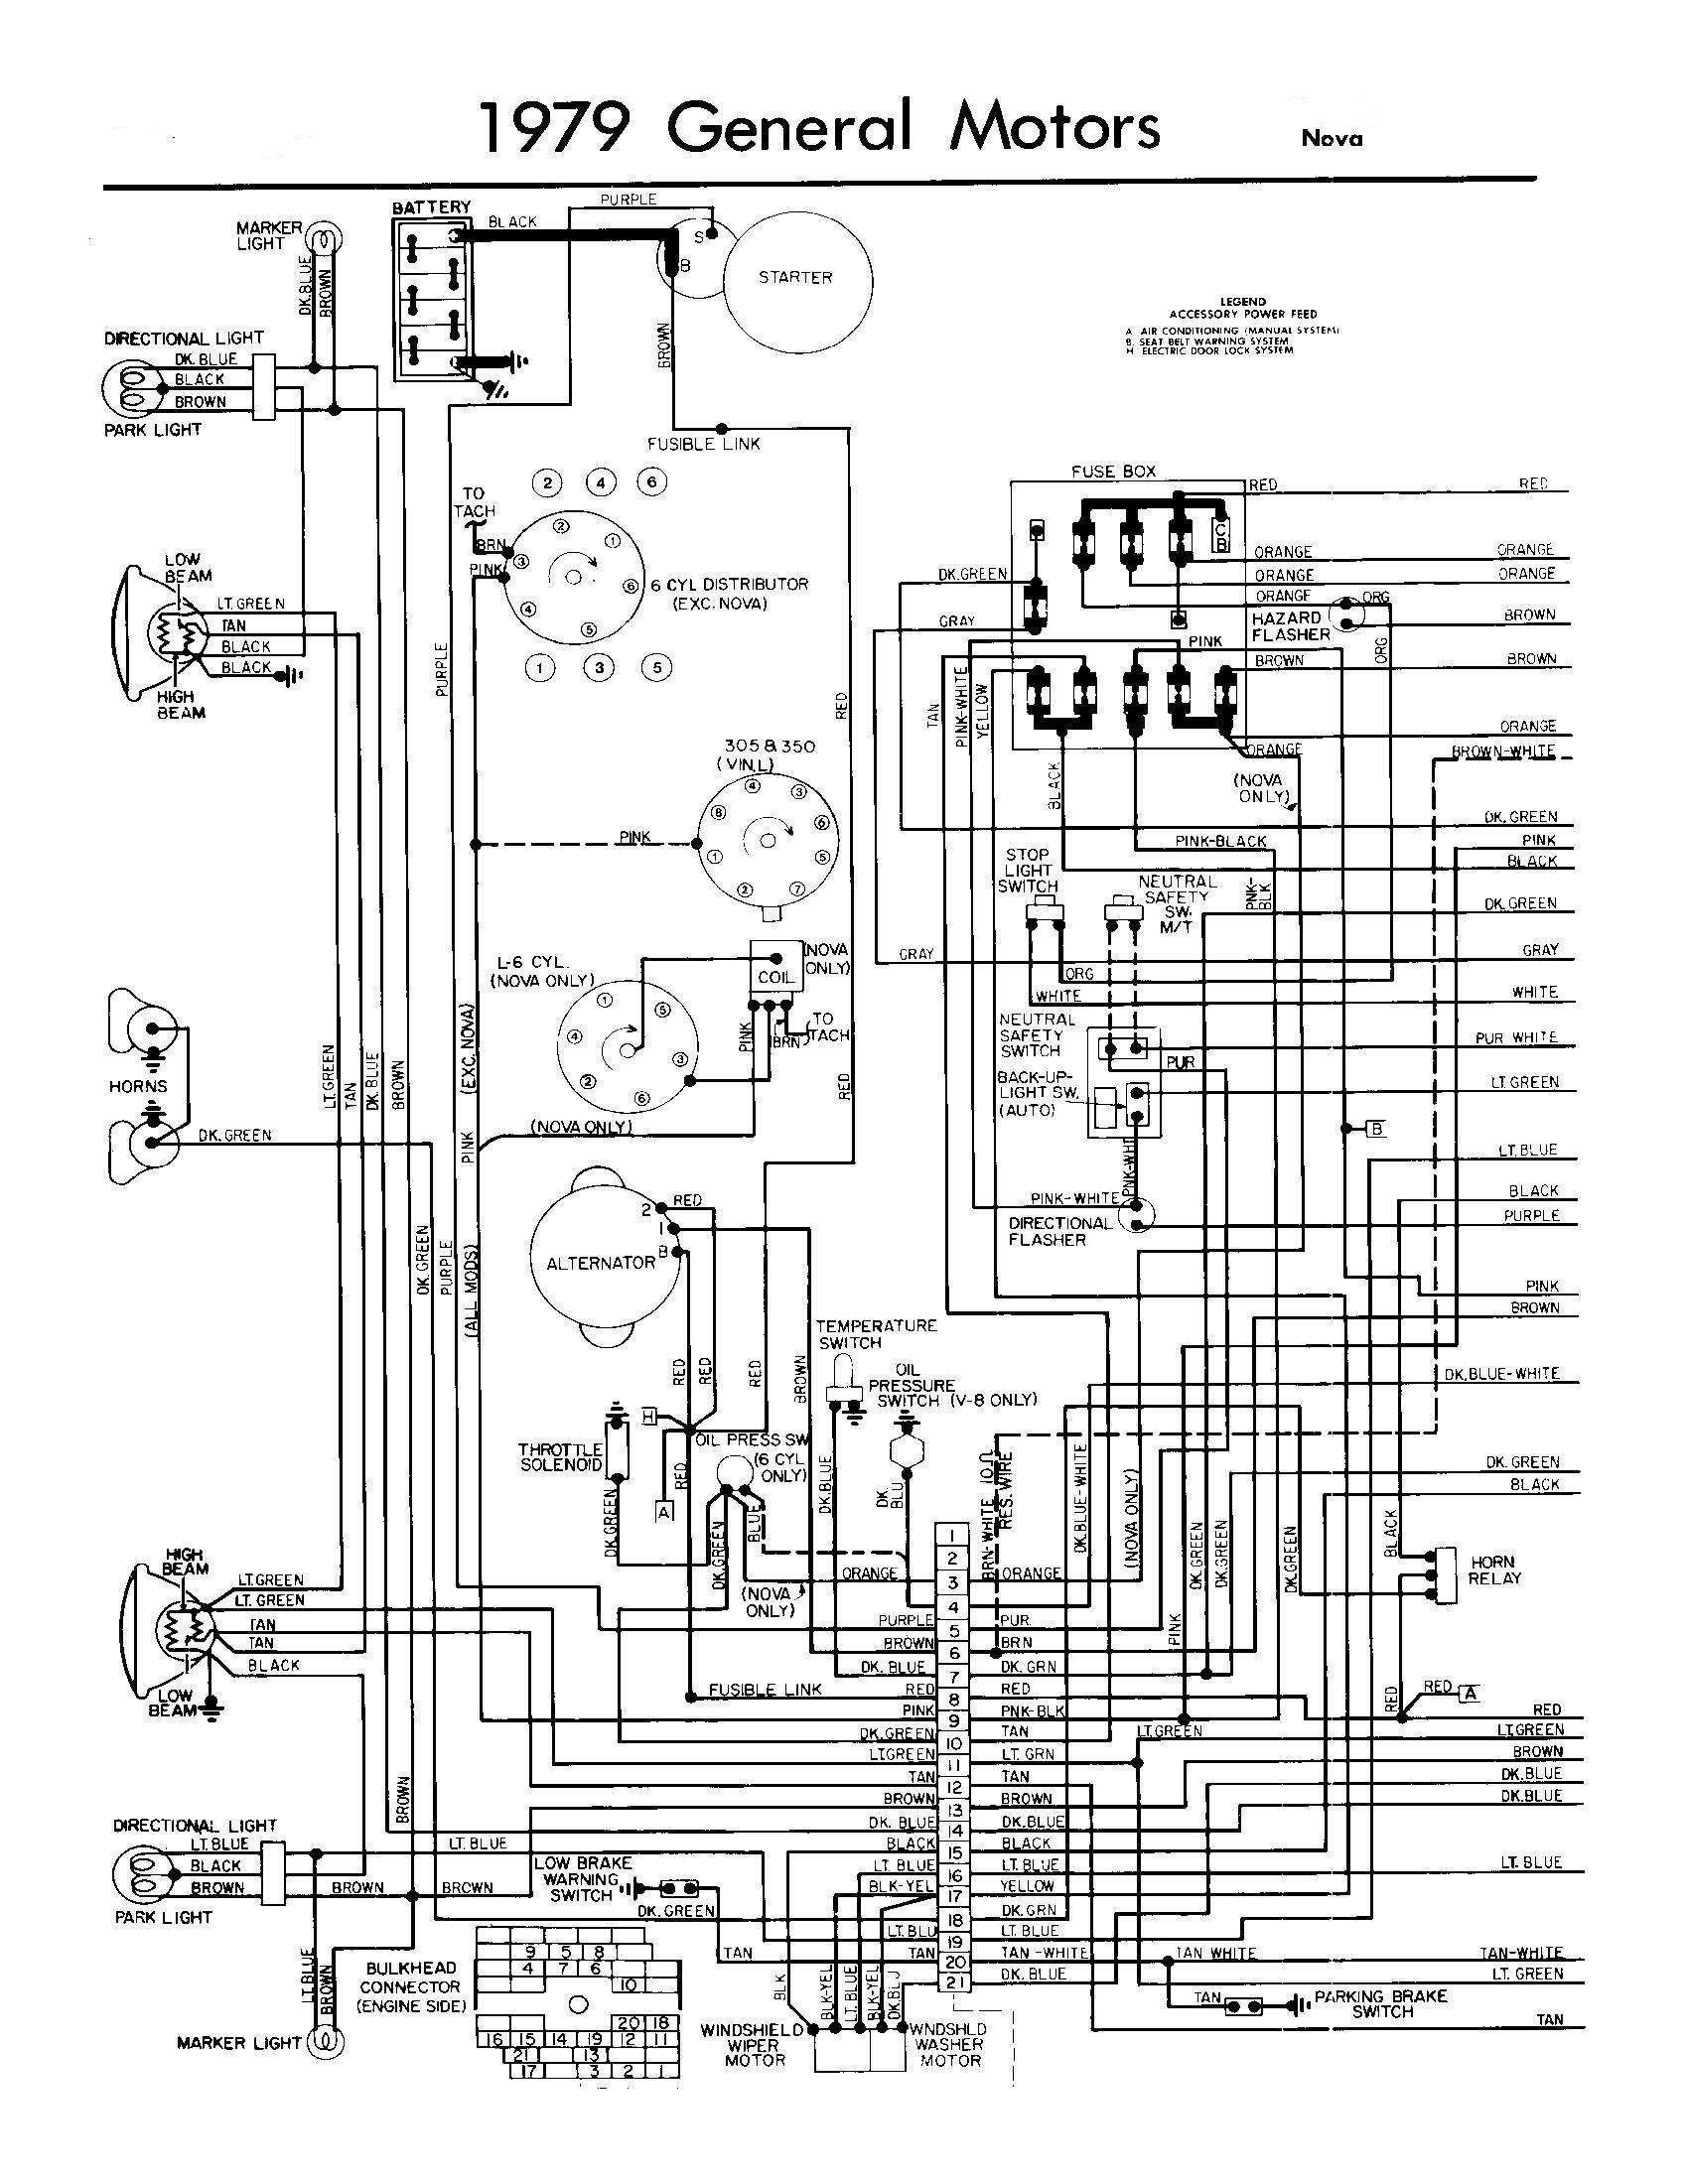 Cx500 E Sports Service Manual Wiring Diagram | Wiring Diagram - International Truck Wiring Diagram Manual